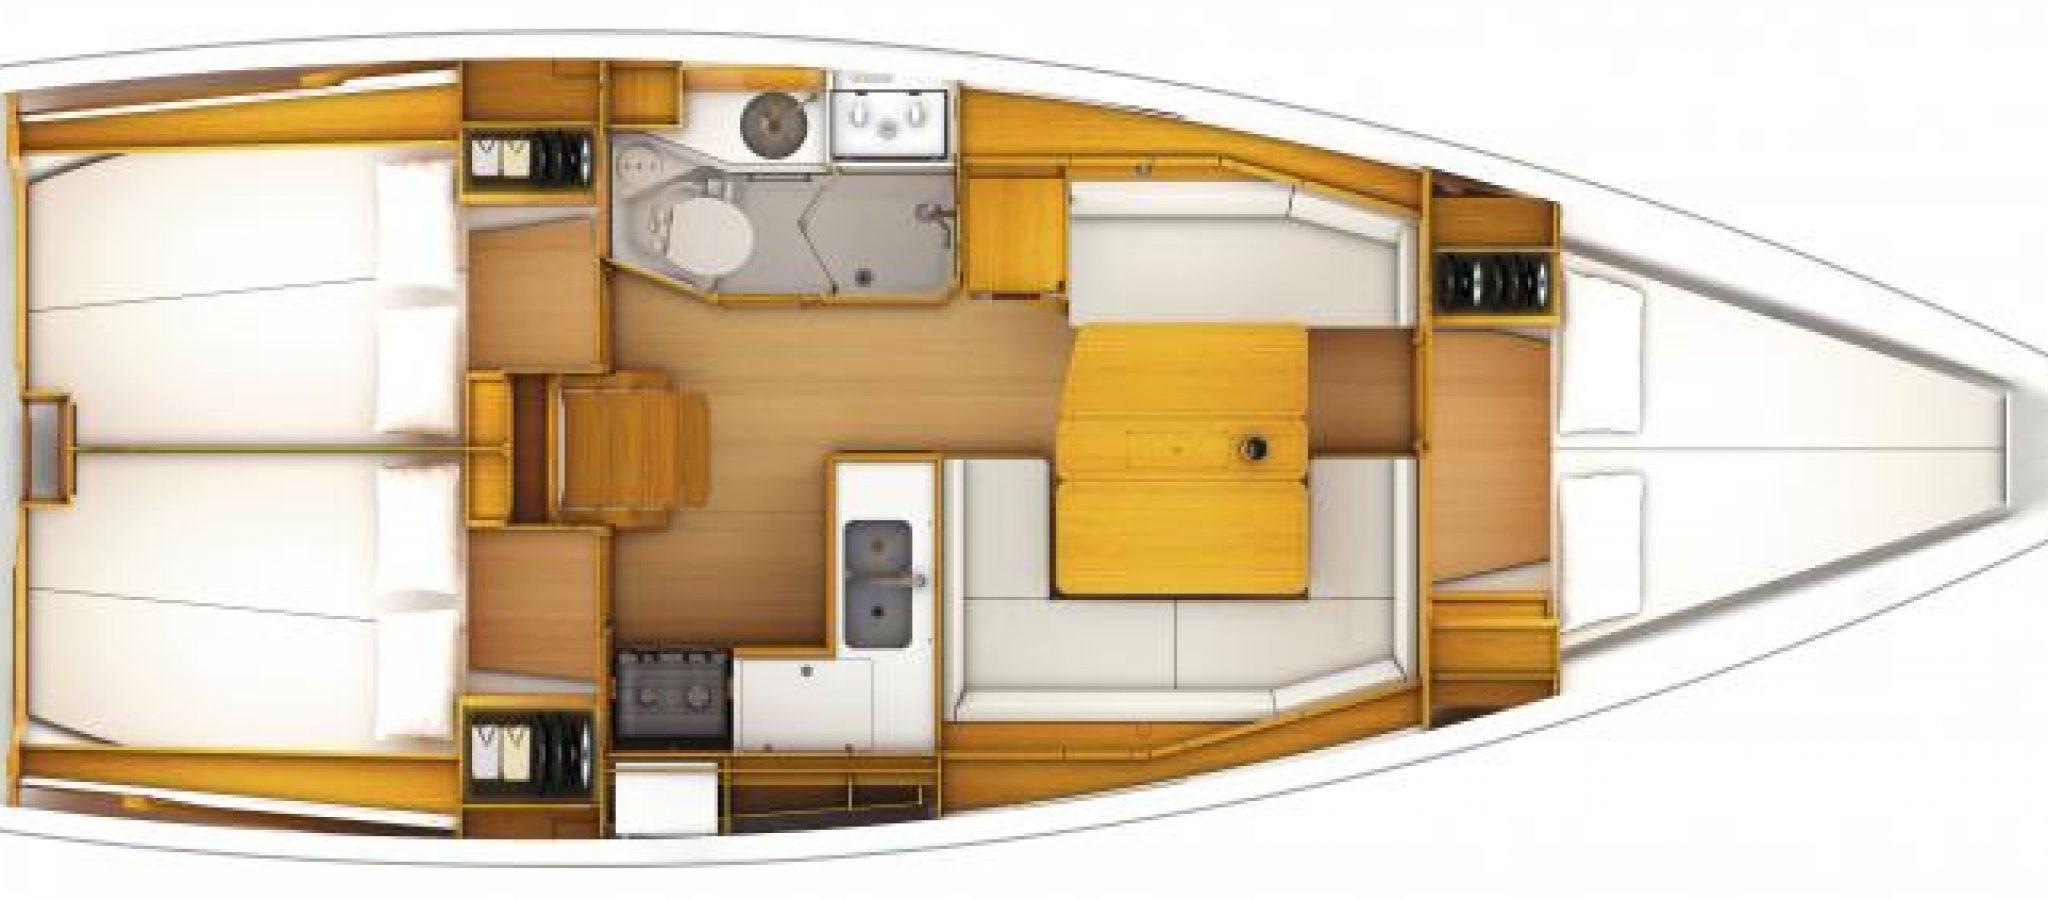 Sun Odyssey 379 plan 3 cabines